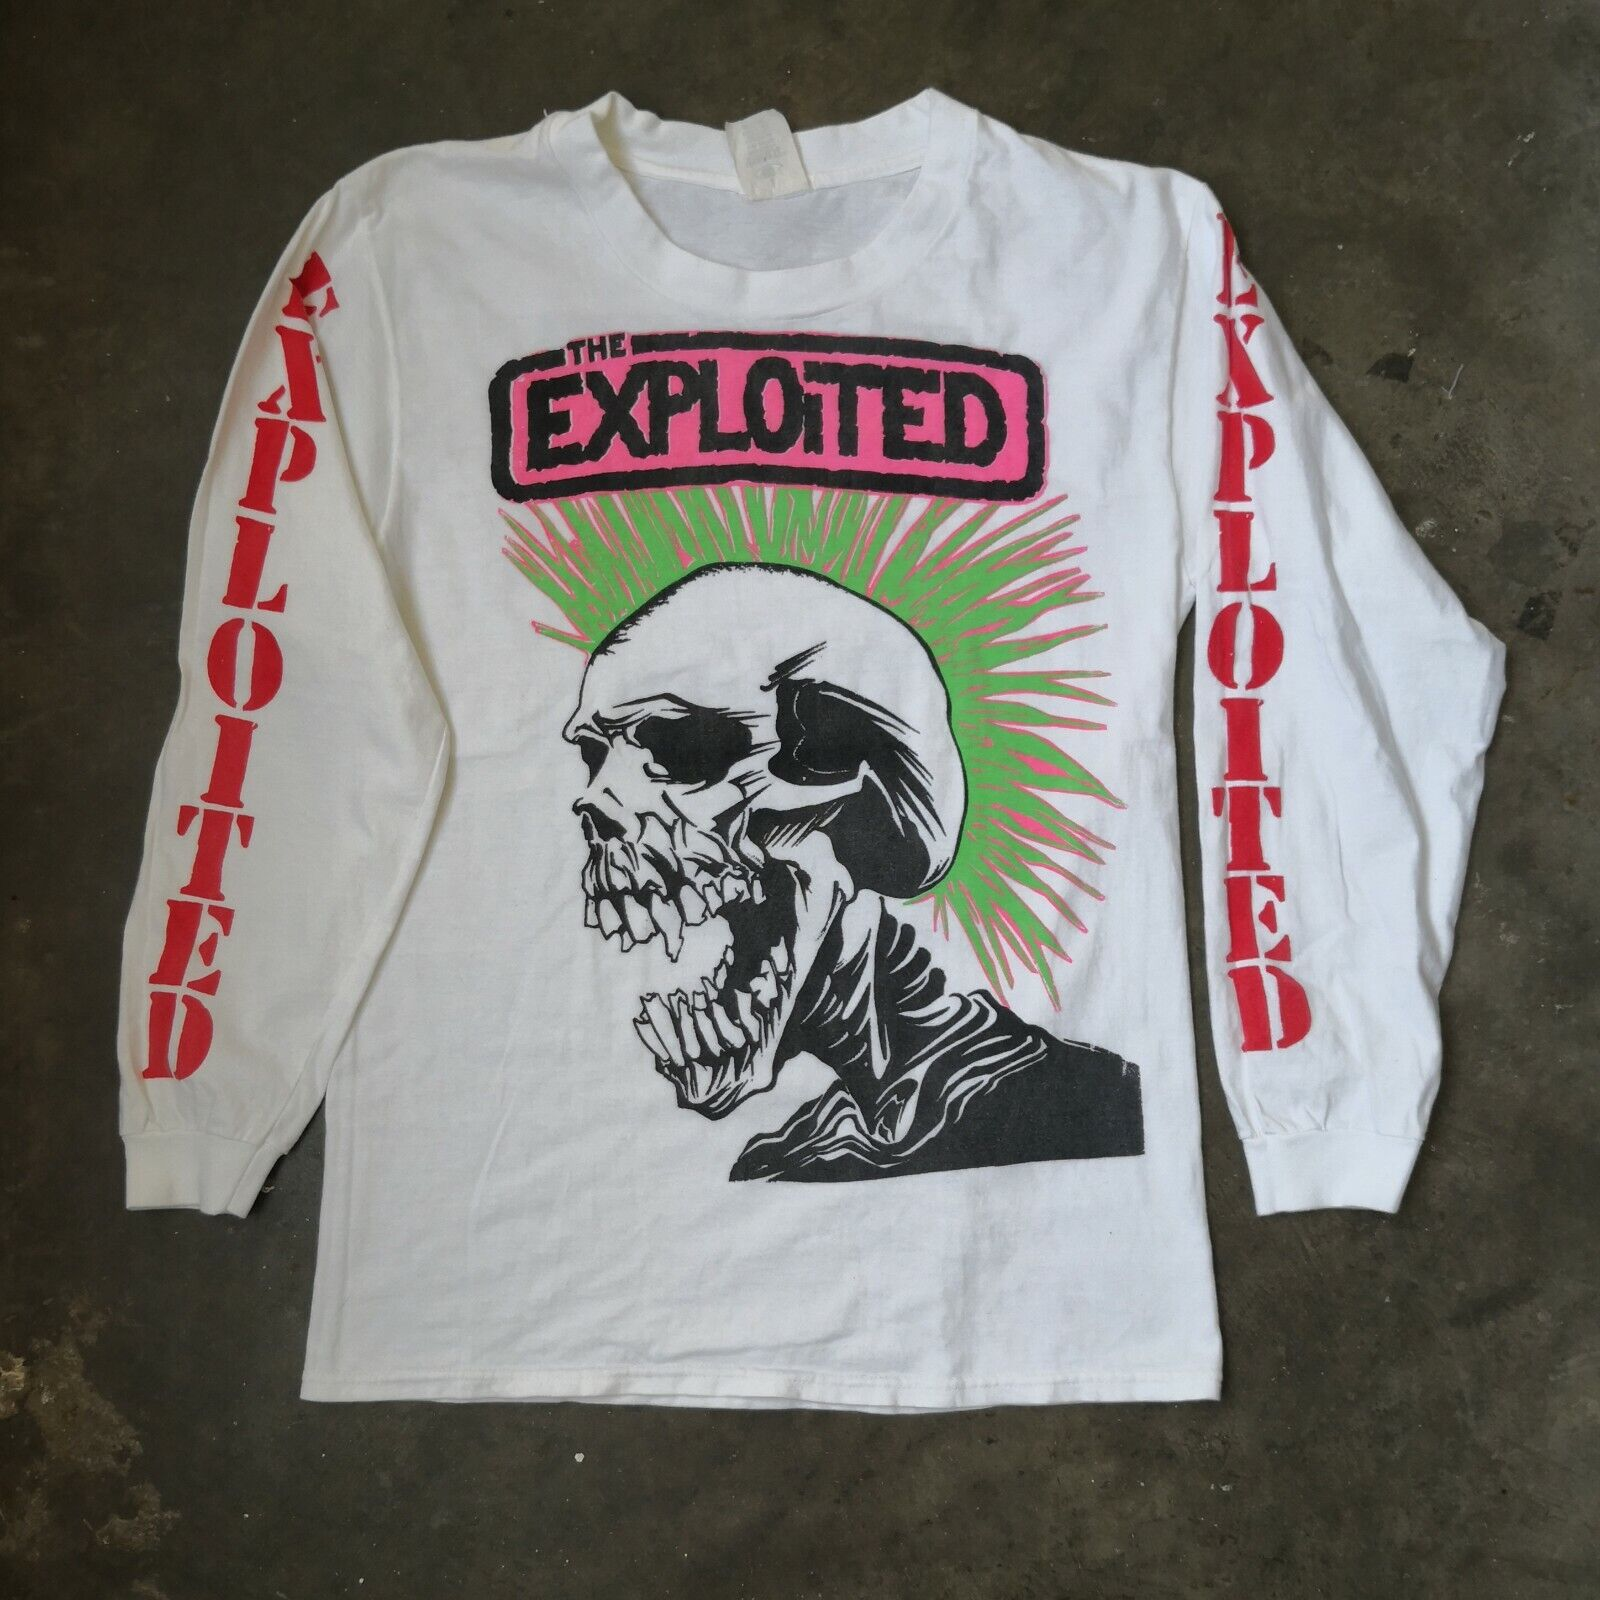 Ultra Rare Vintage 90s The Exploited Wattie Buchan Punk Rock Metal T-shirt